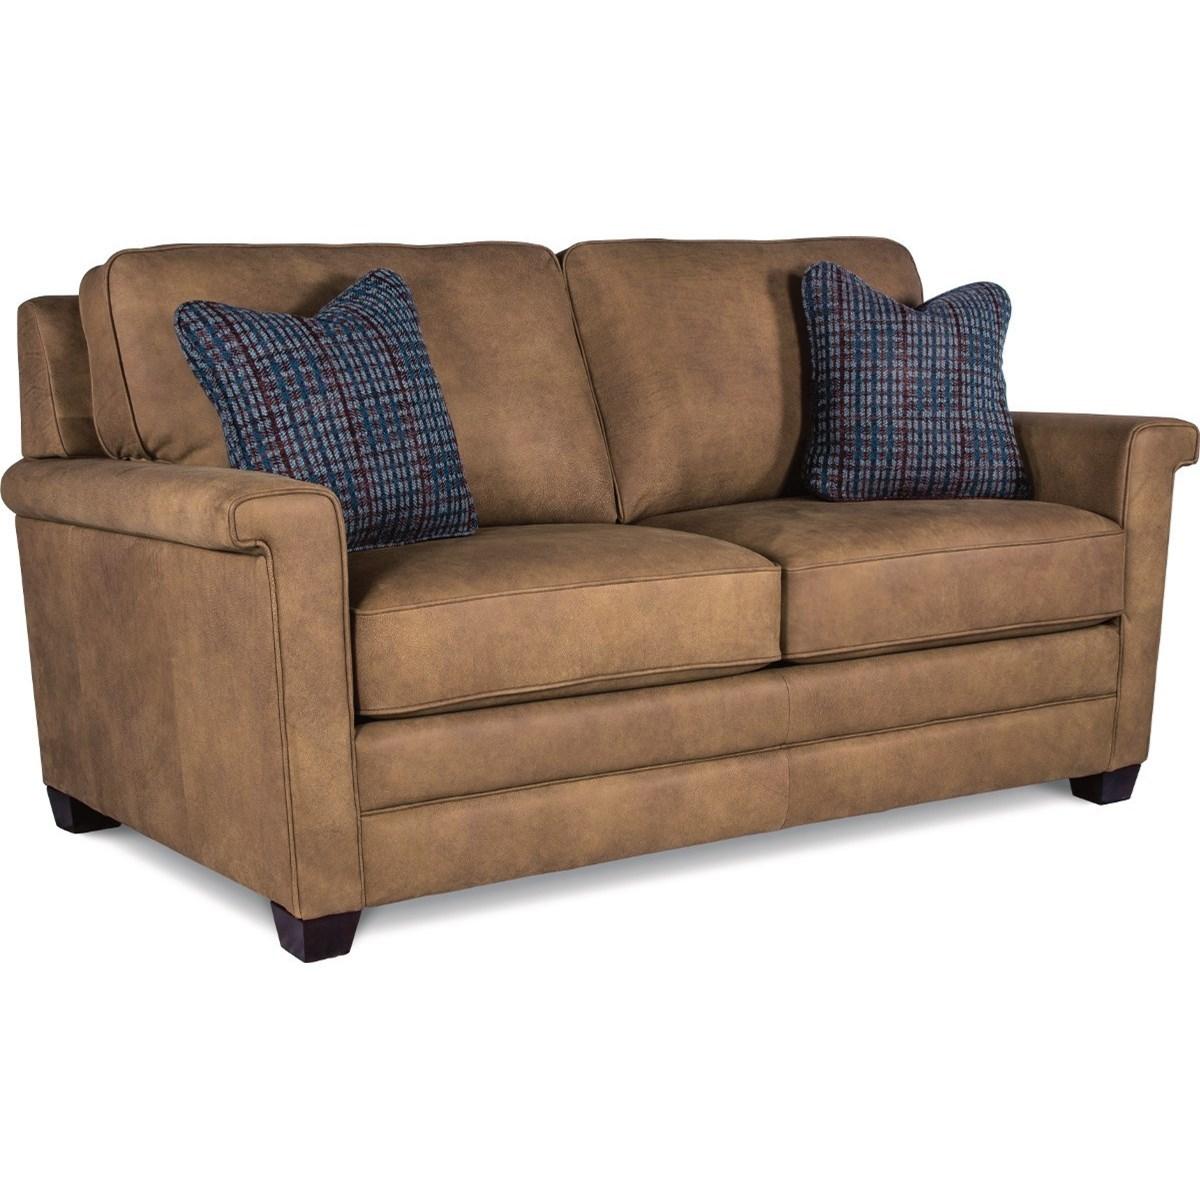 La-Z-Boy Bexley Contemporary Apartment Size Sofa